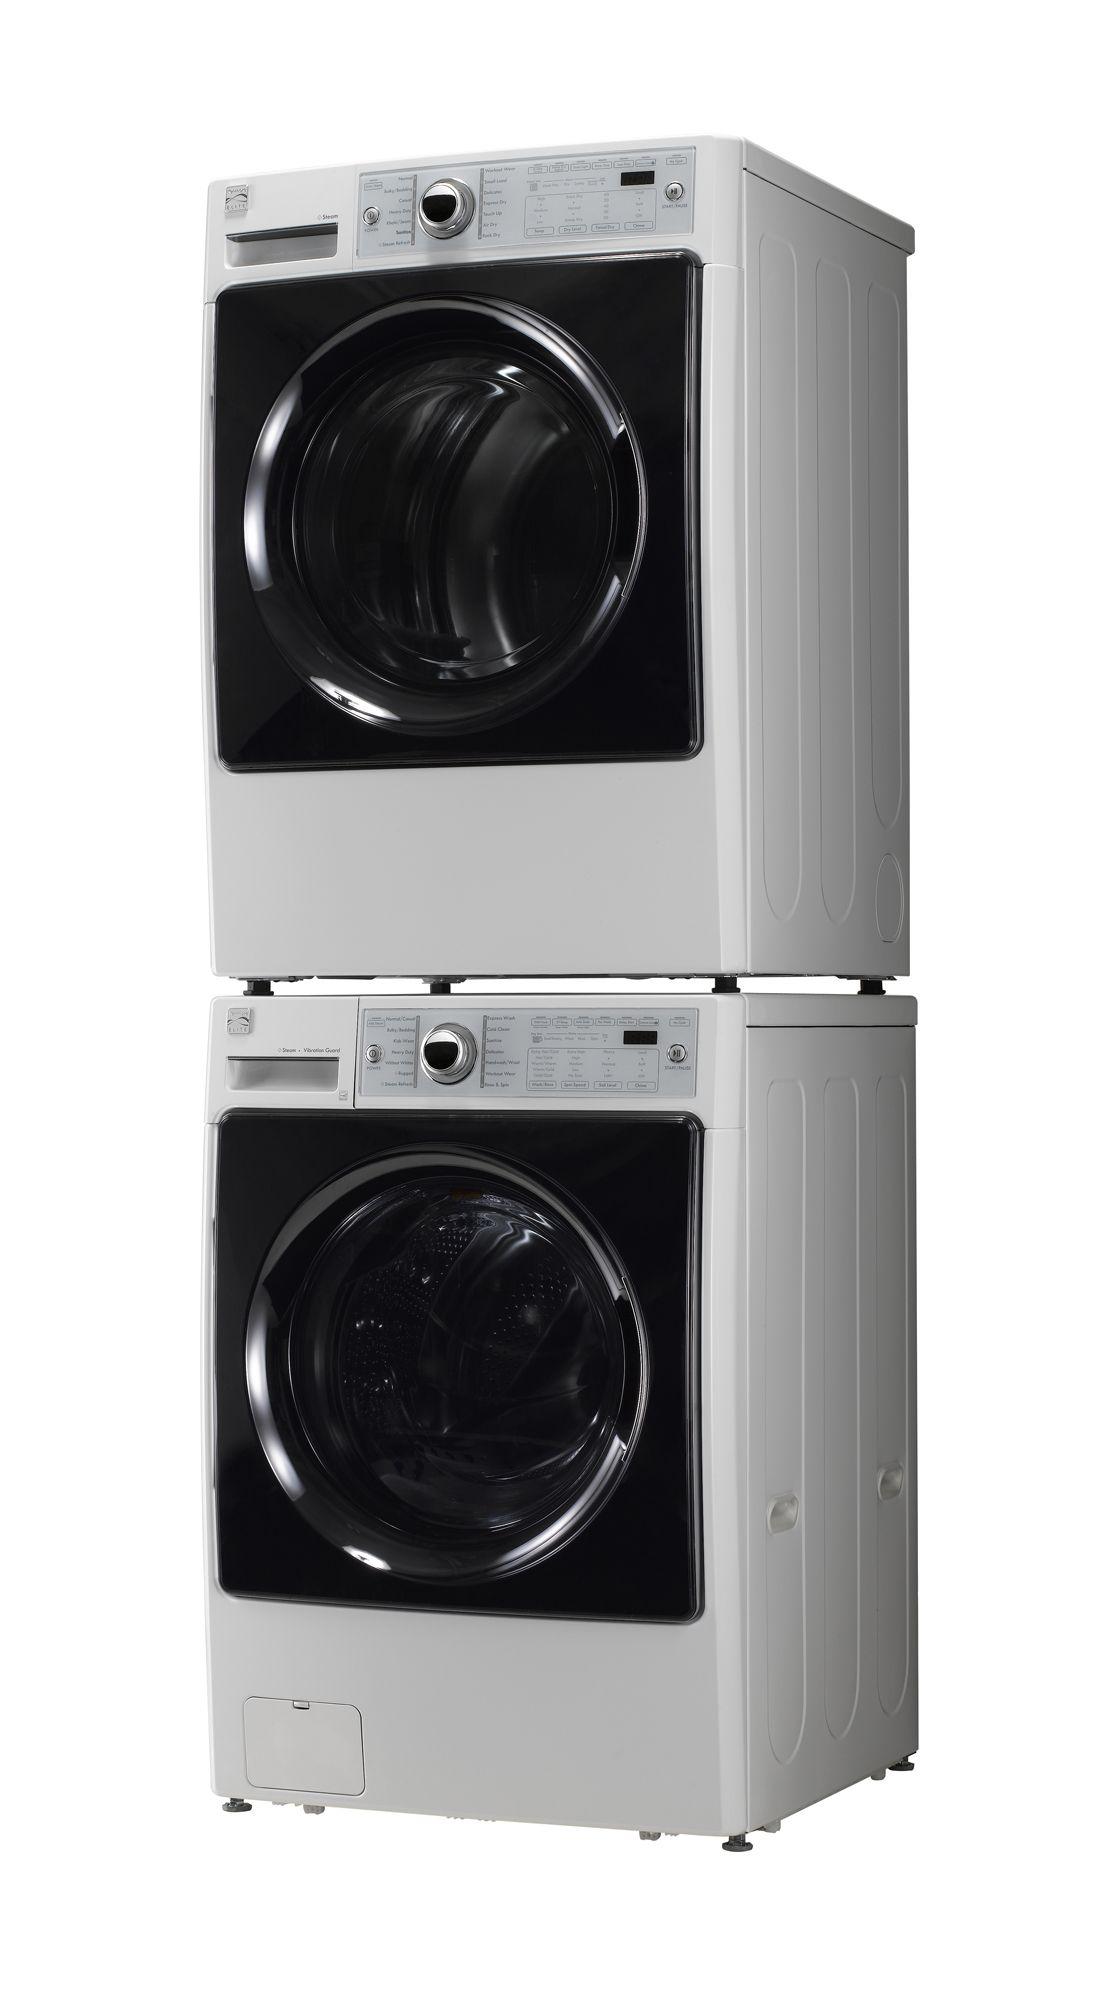 Kenmore Elite 7.4 cu. ft. Electric Steam Dryer - 8219